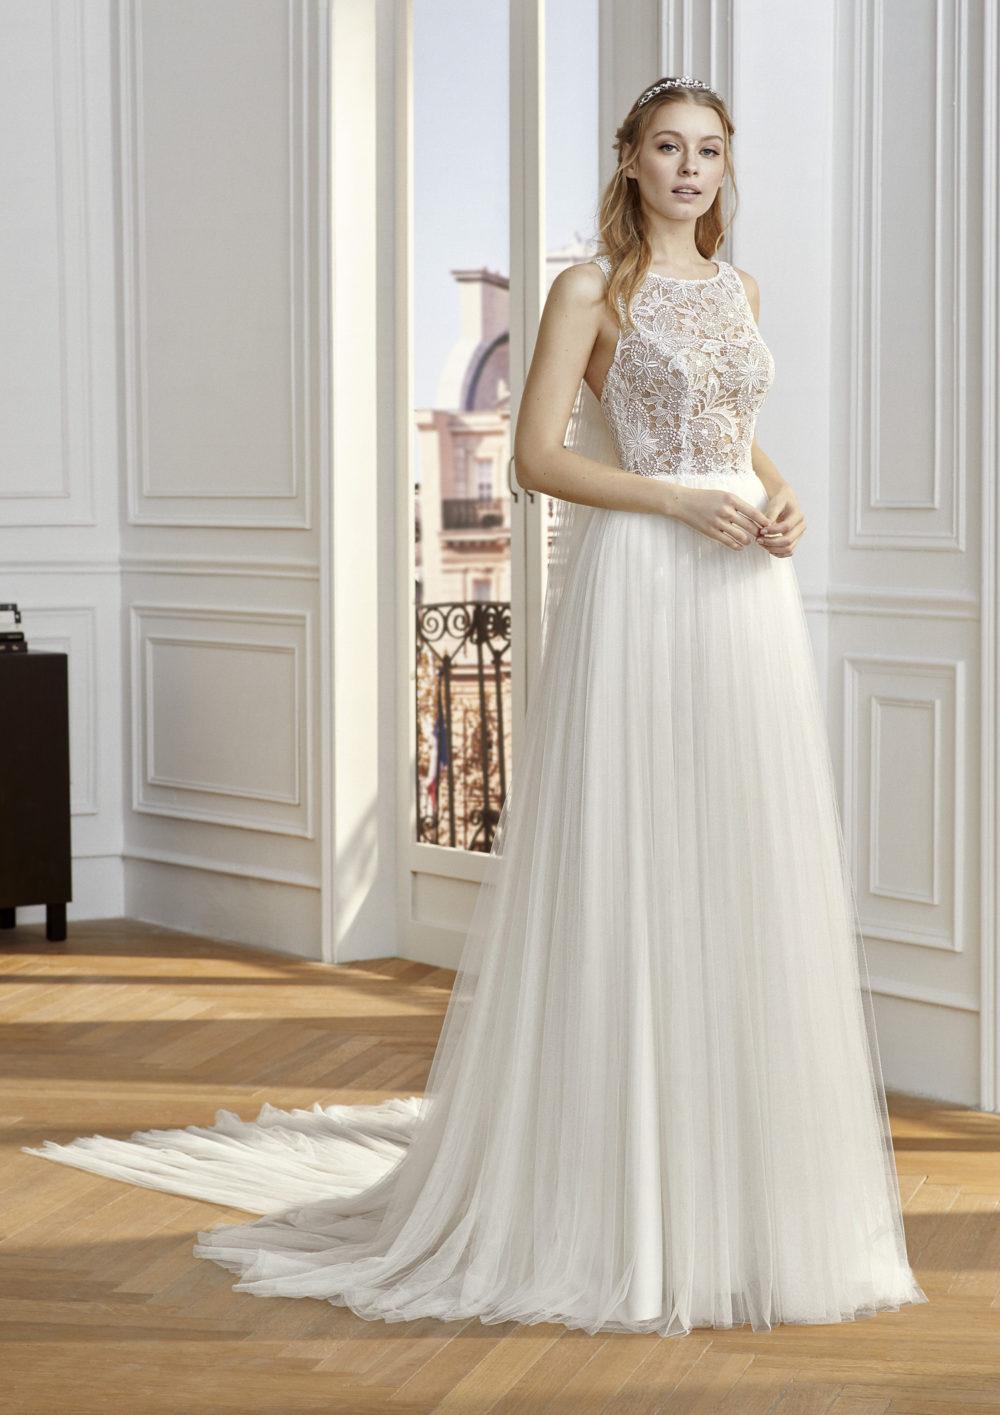 Mariages: abito da sposa San Patrick 2020 a Vicenza, Verona, Padova, Veneto BOULOGNE